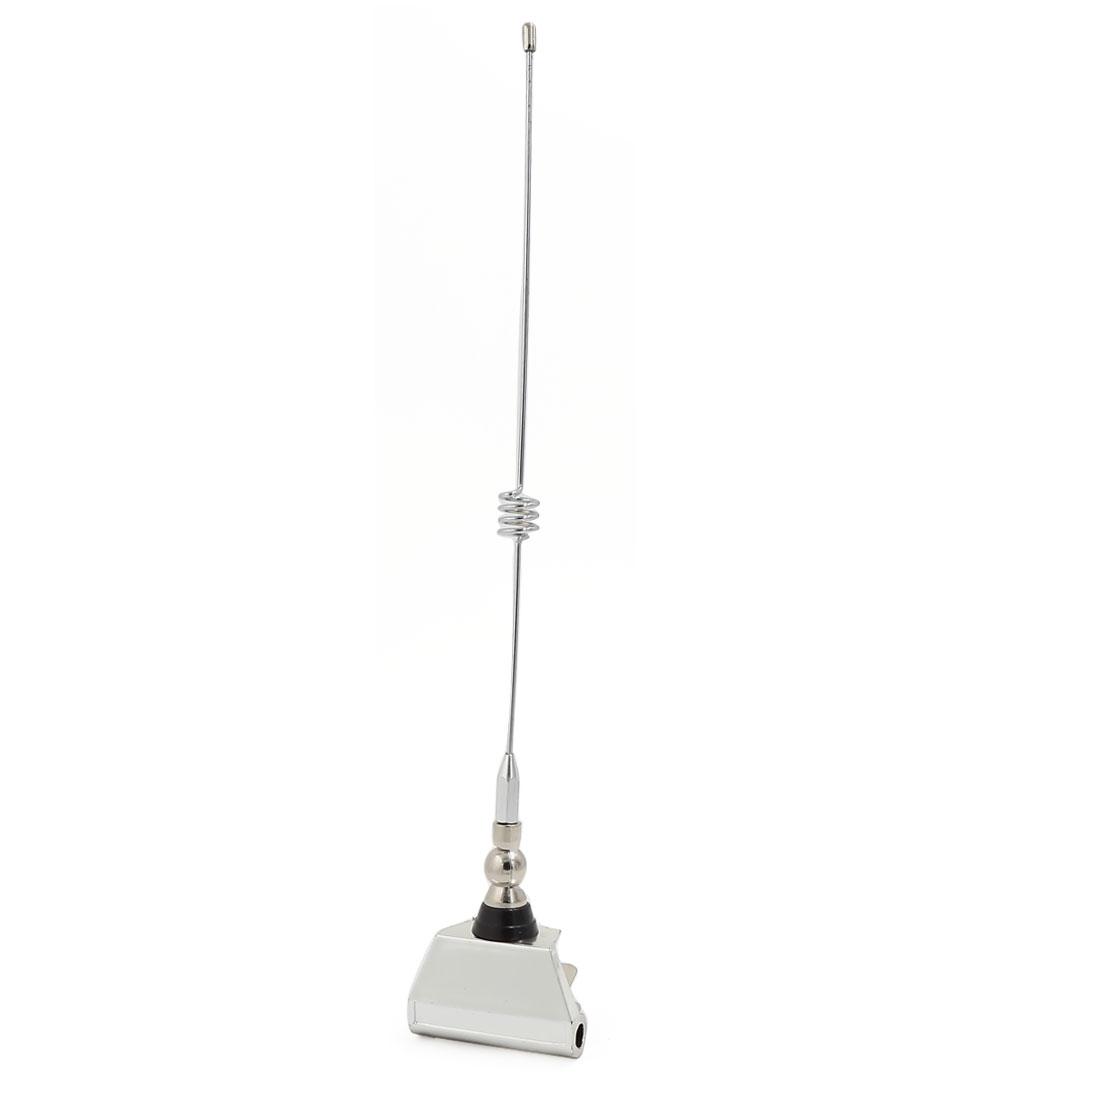 Adjustable Angle Base Anti Static Car Auto Decorative Antenna Aerial 435mm Long